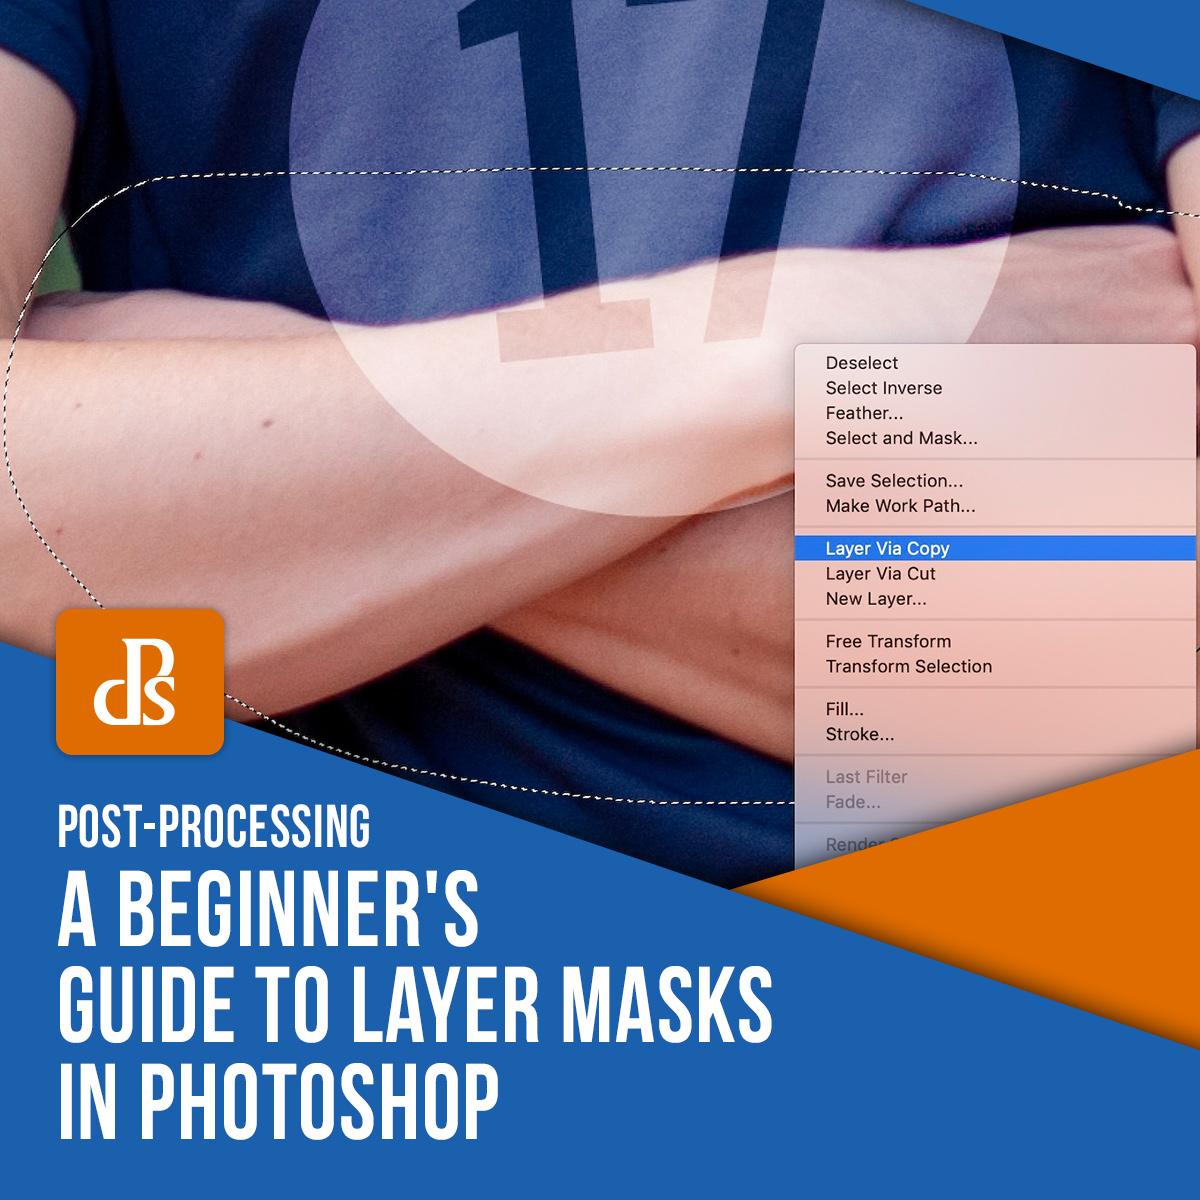 dps-layer-masks-in-photoshop